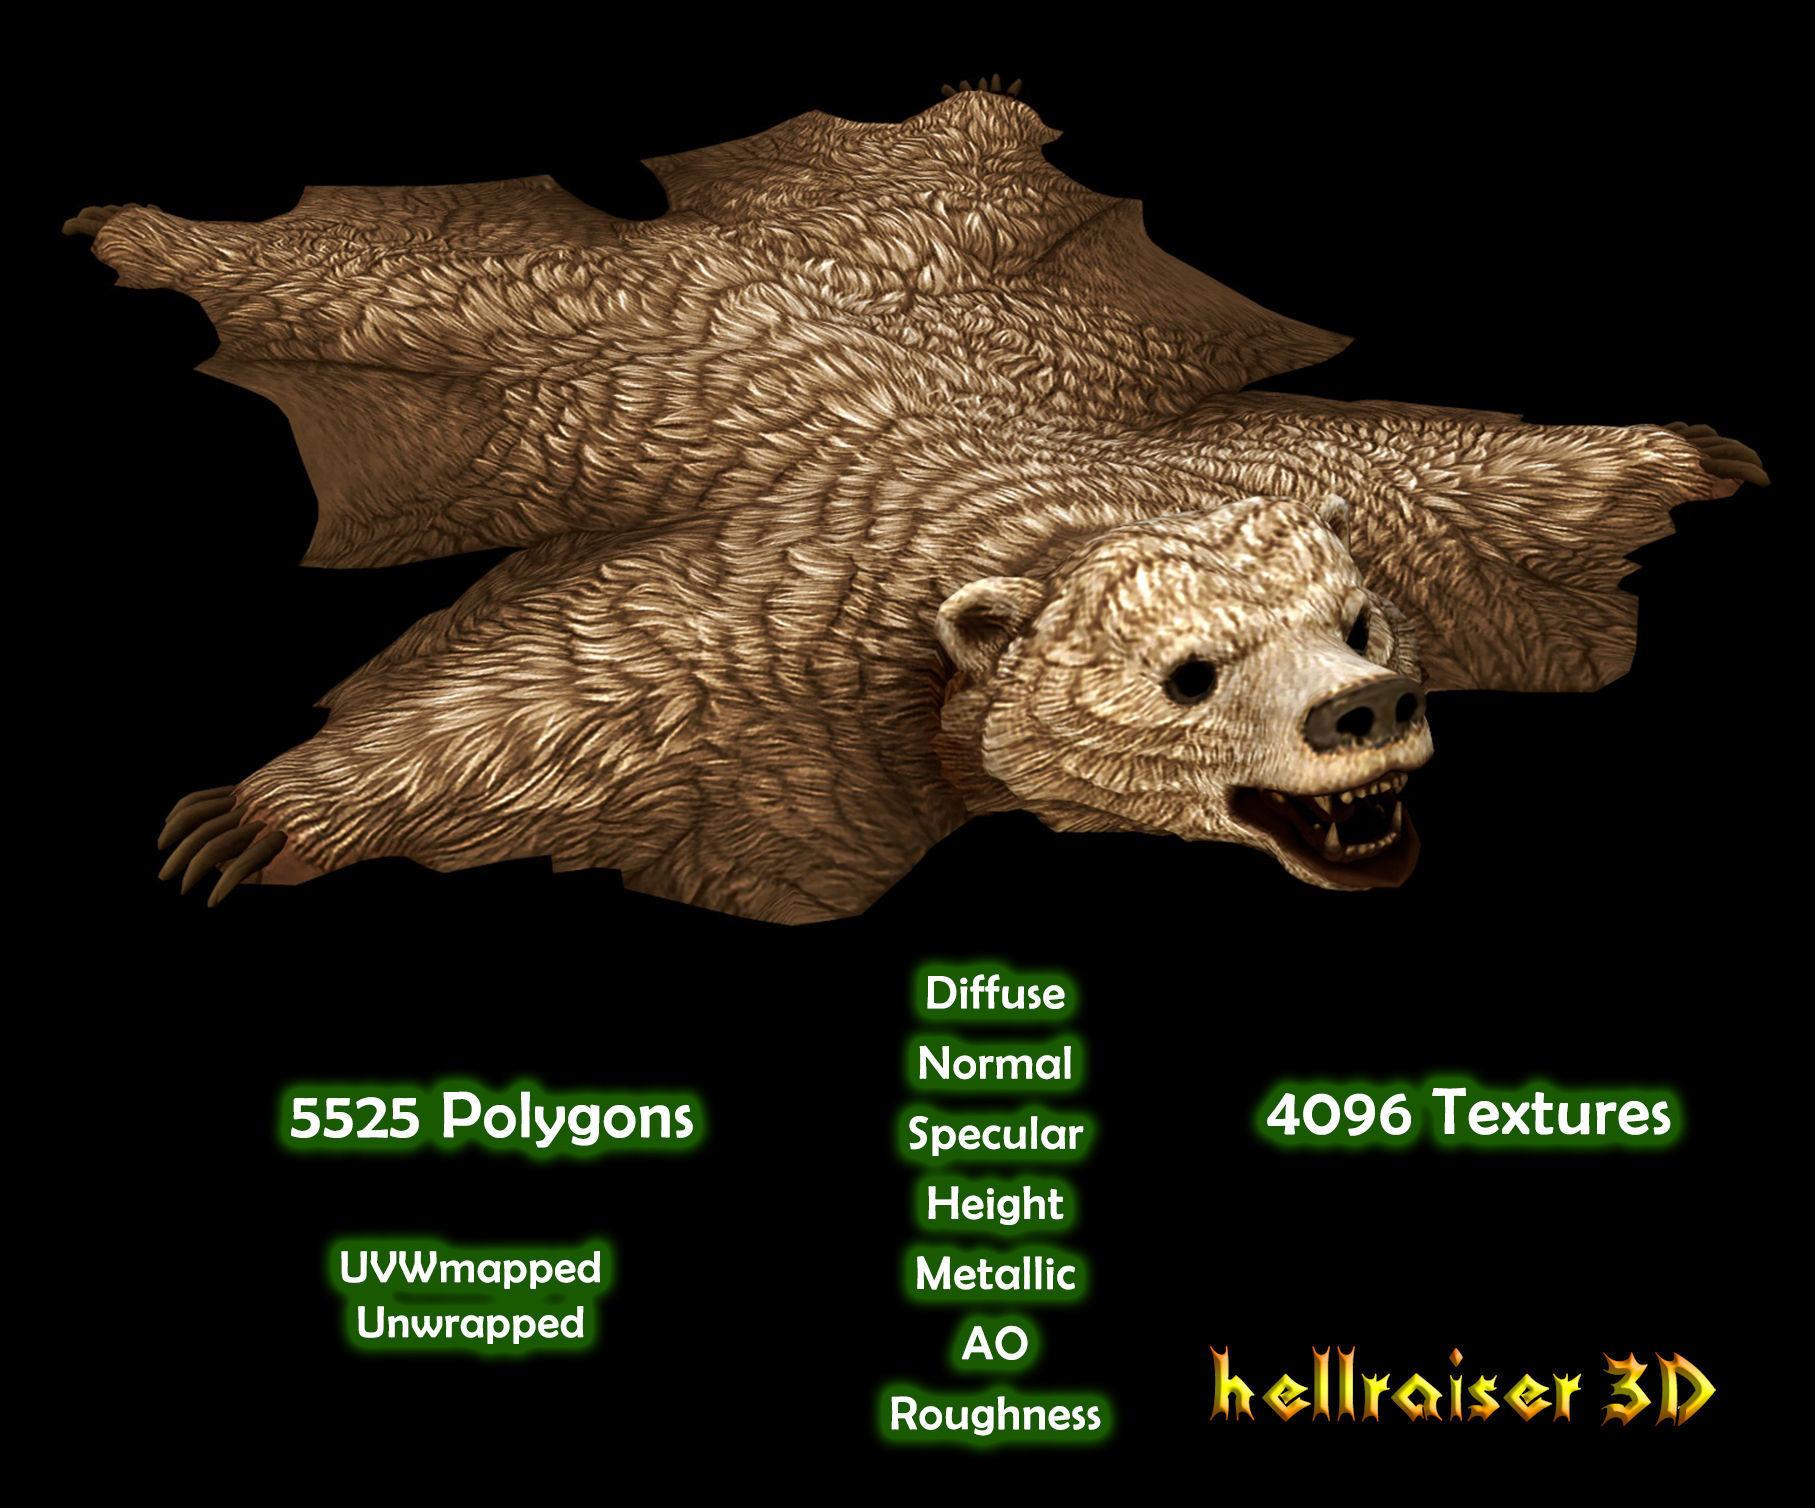 Bear Rug - PBR - Textured